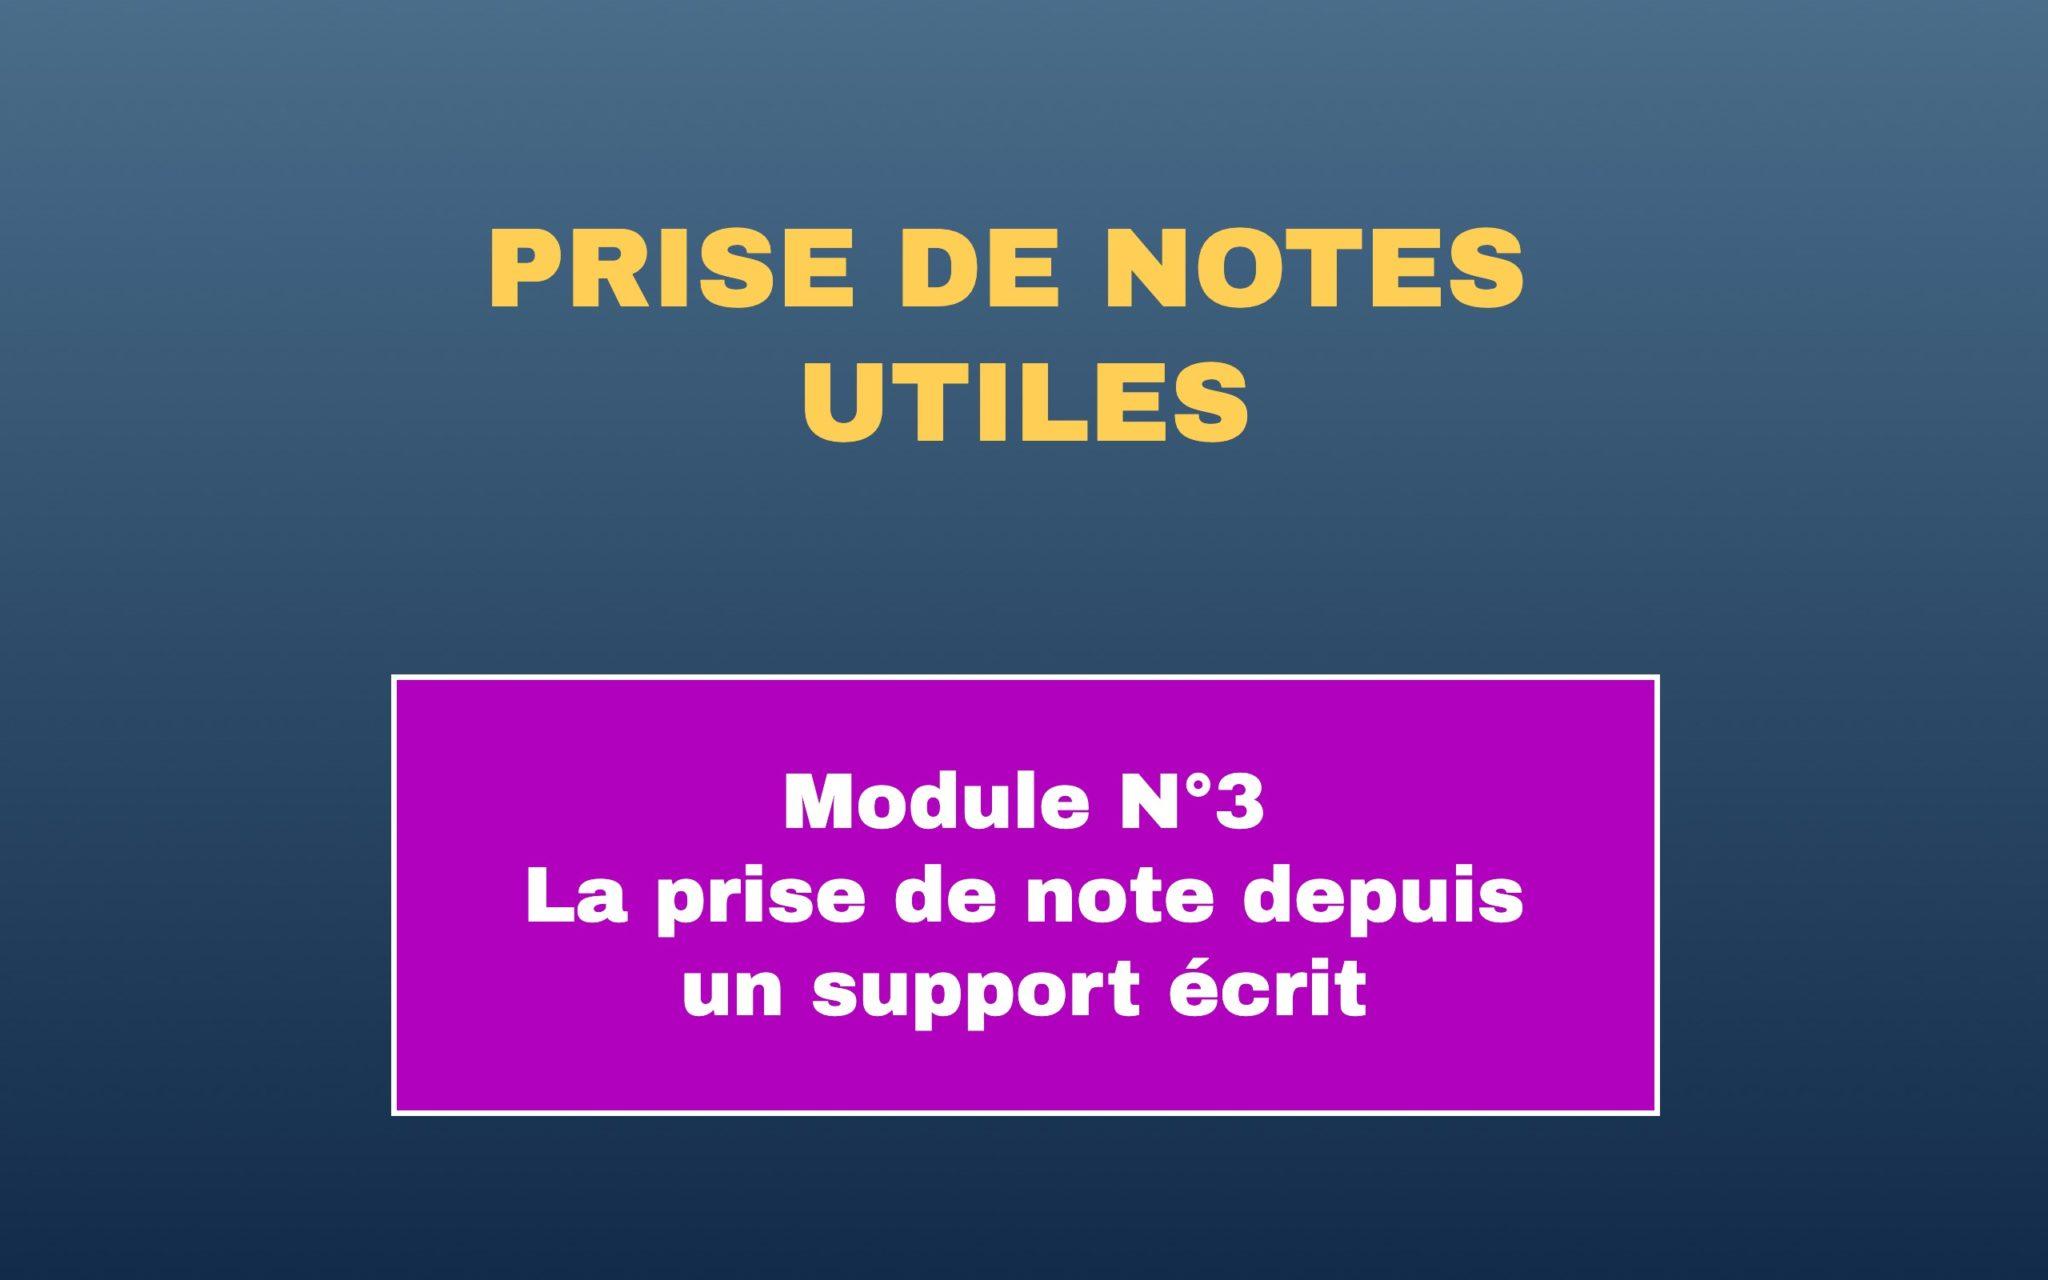 Prise de note module 3